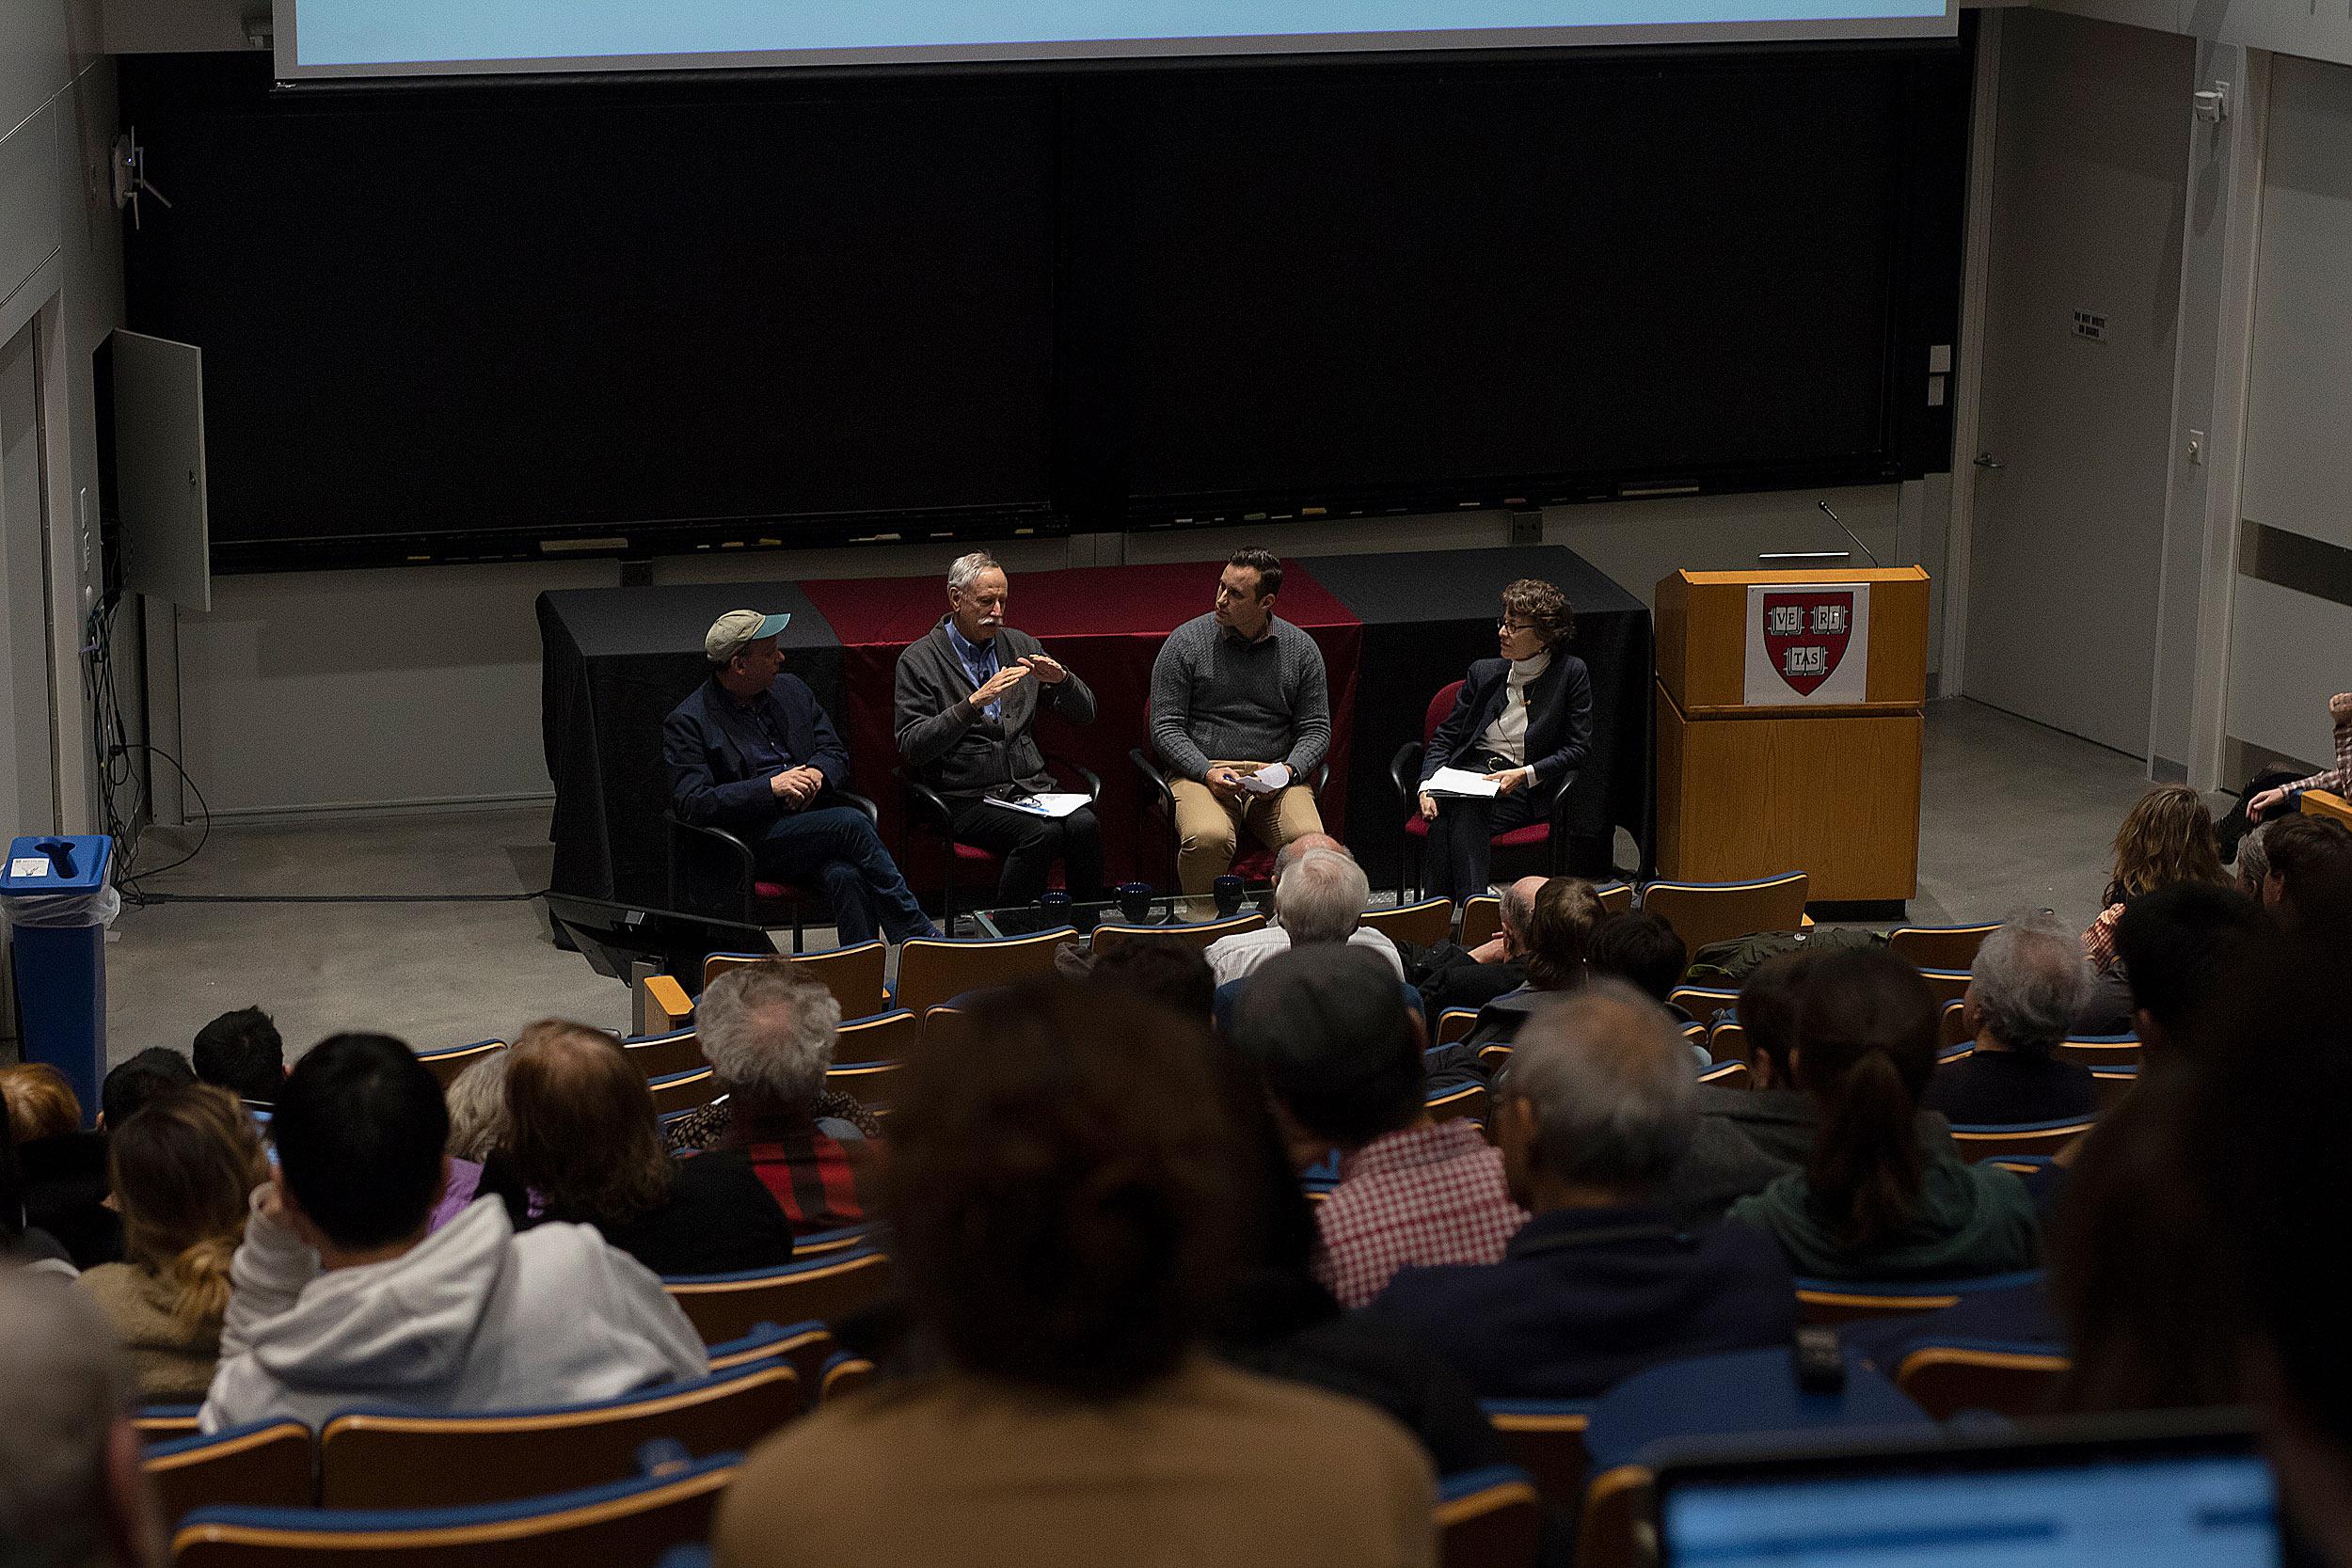 From left to right, Paul Greenberg, Professor Walter Willett, Professor Christopher Golden, and Professor Susan Korrick.